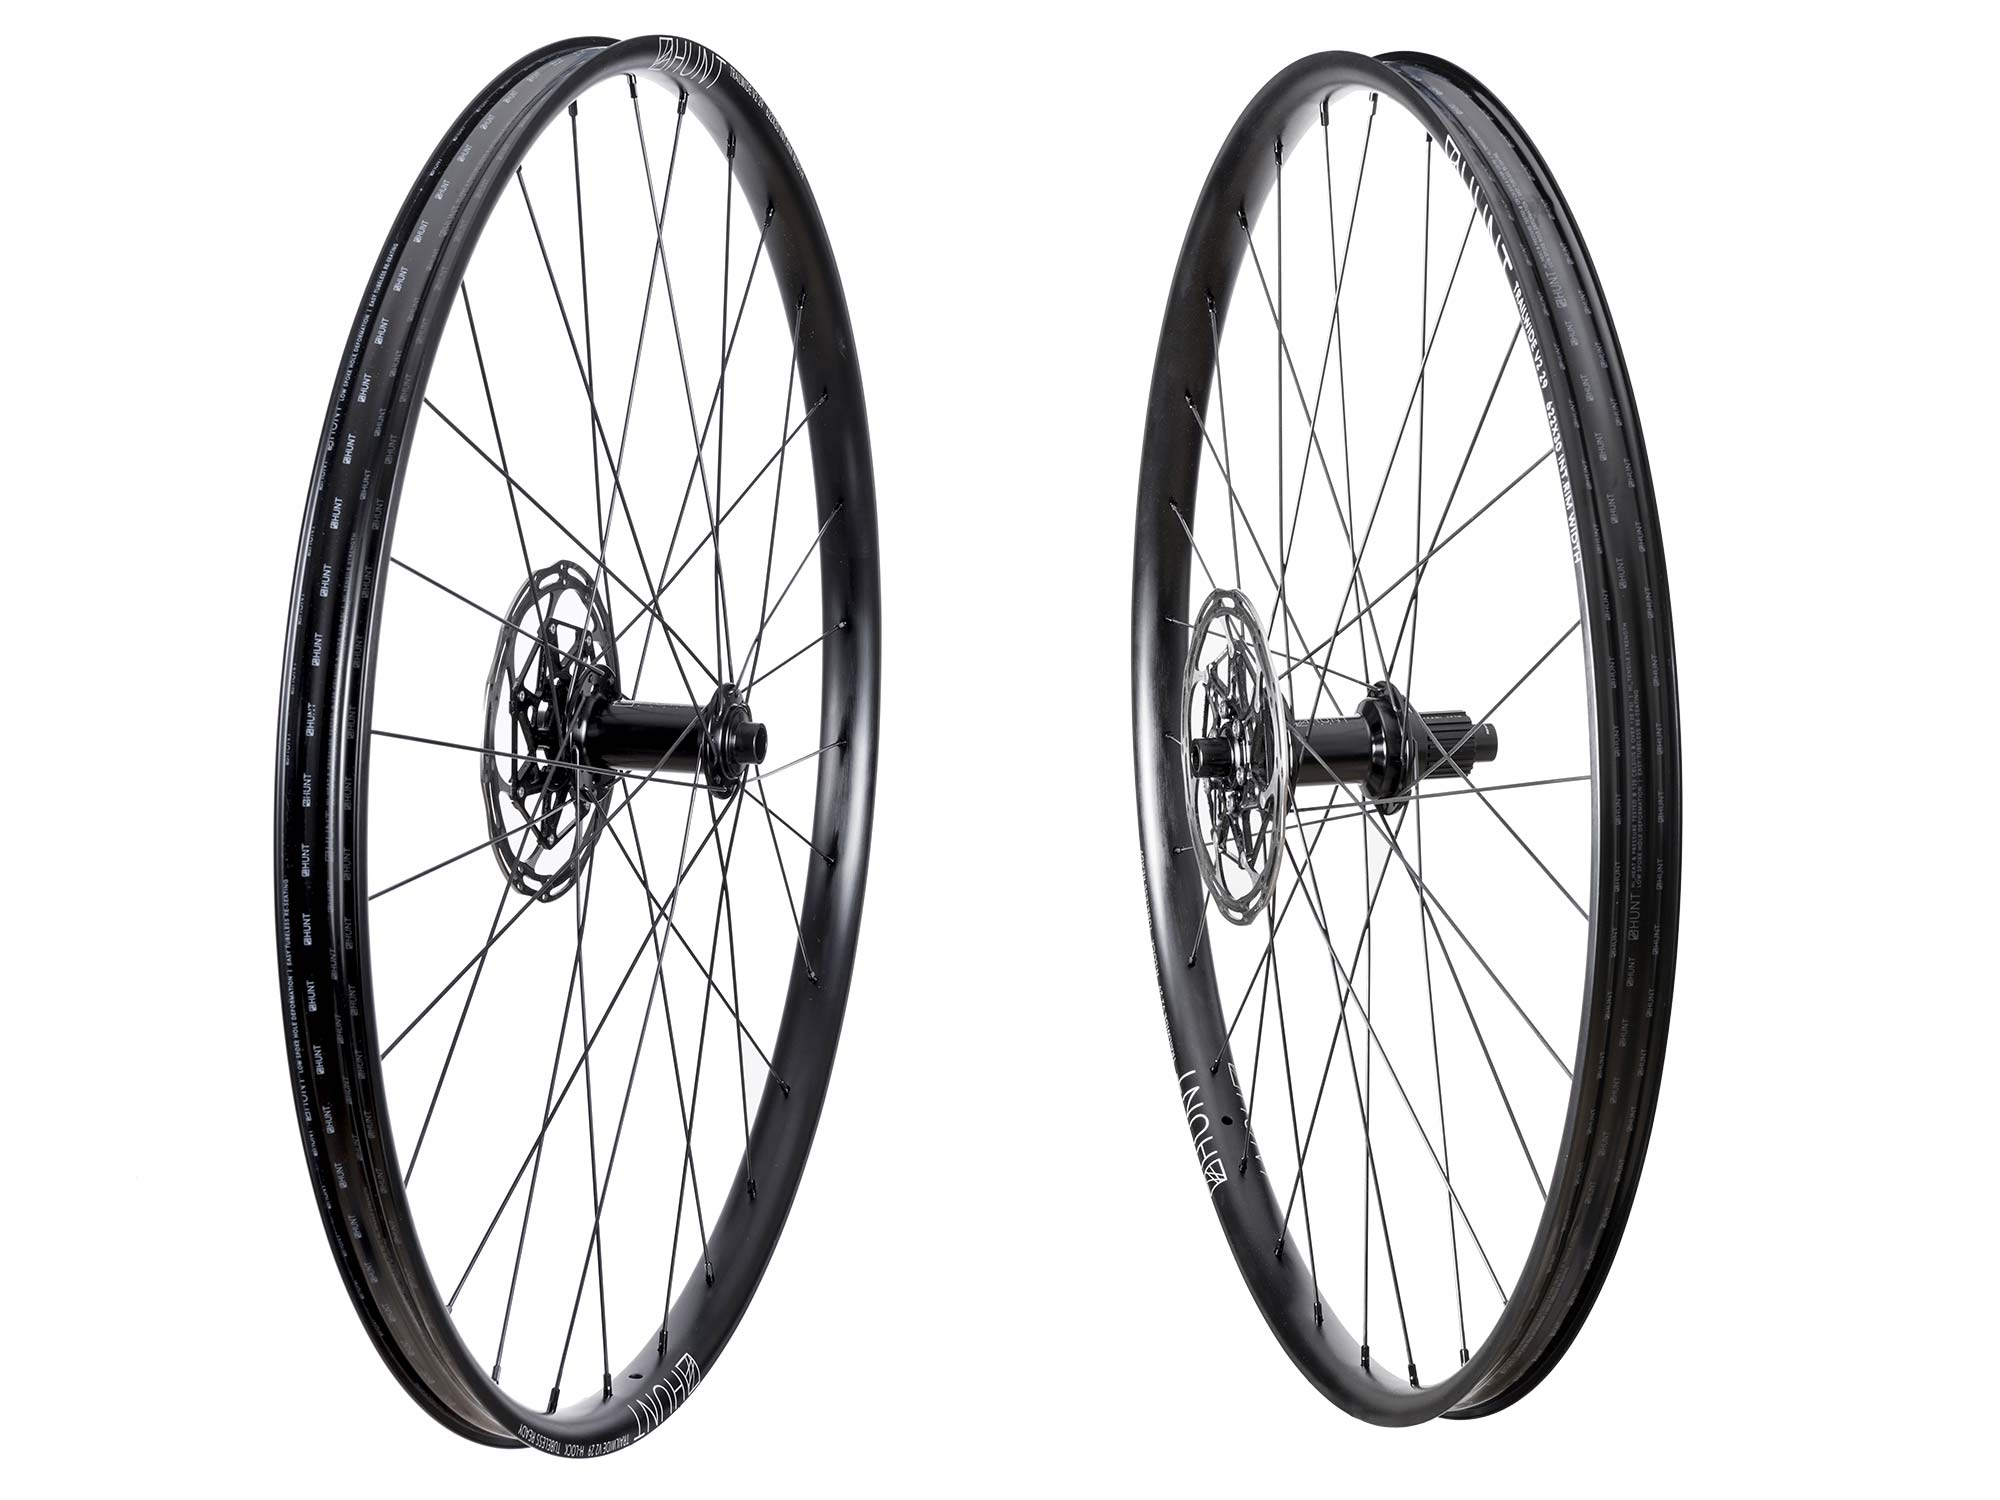 Hunt Trail Wide v2 versatile alloy mountain bike wheels set